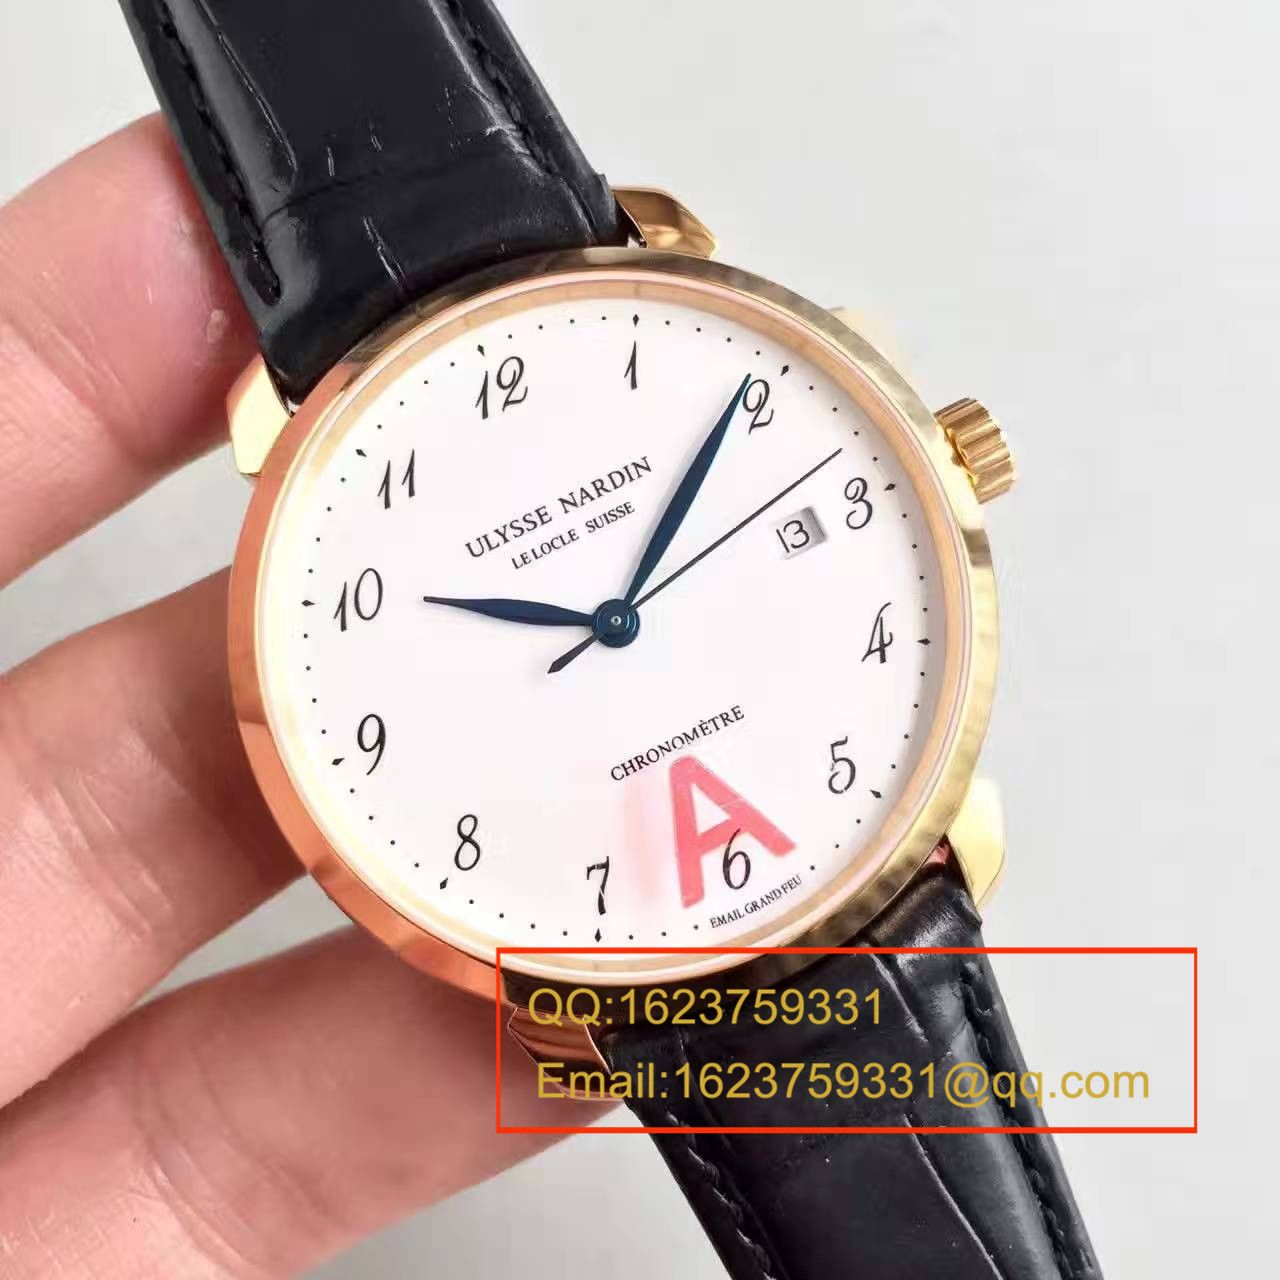 【FK厂顶级复刻手表】雅典经典系列8152-111-2/5GF腕表 / YD010